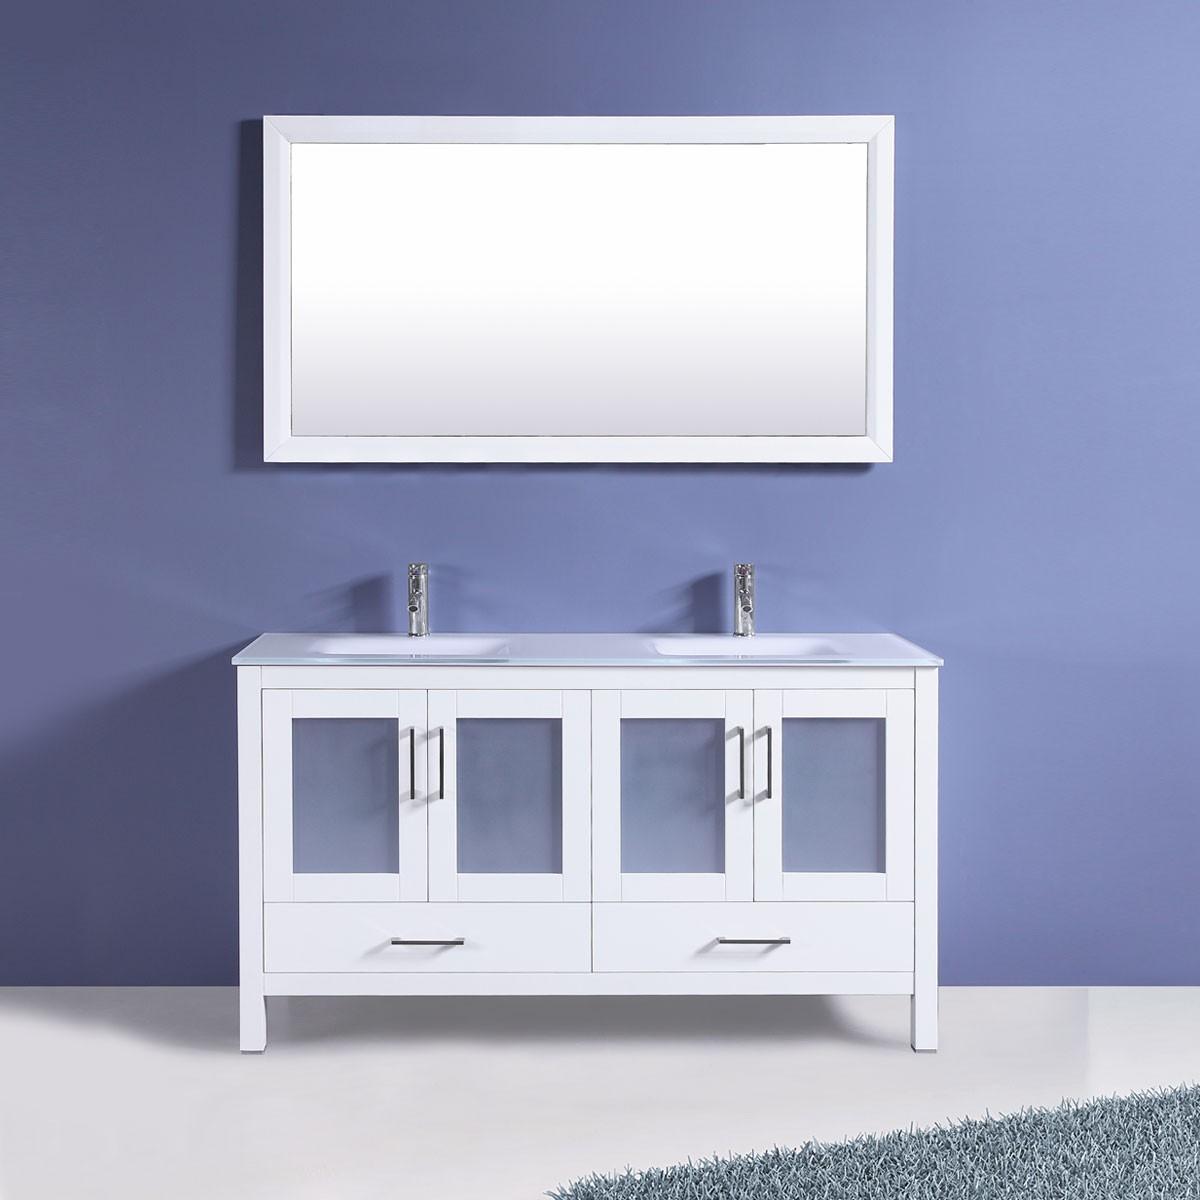 60 In. Freestanding Bathroom Vanity Set with Mirror and Double Sinks ...